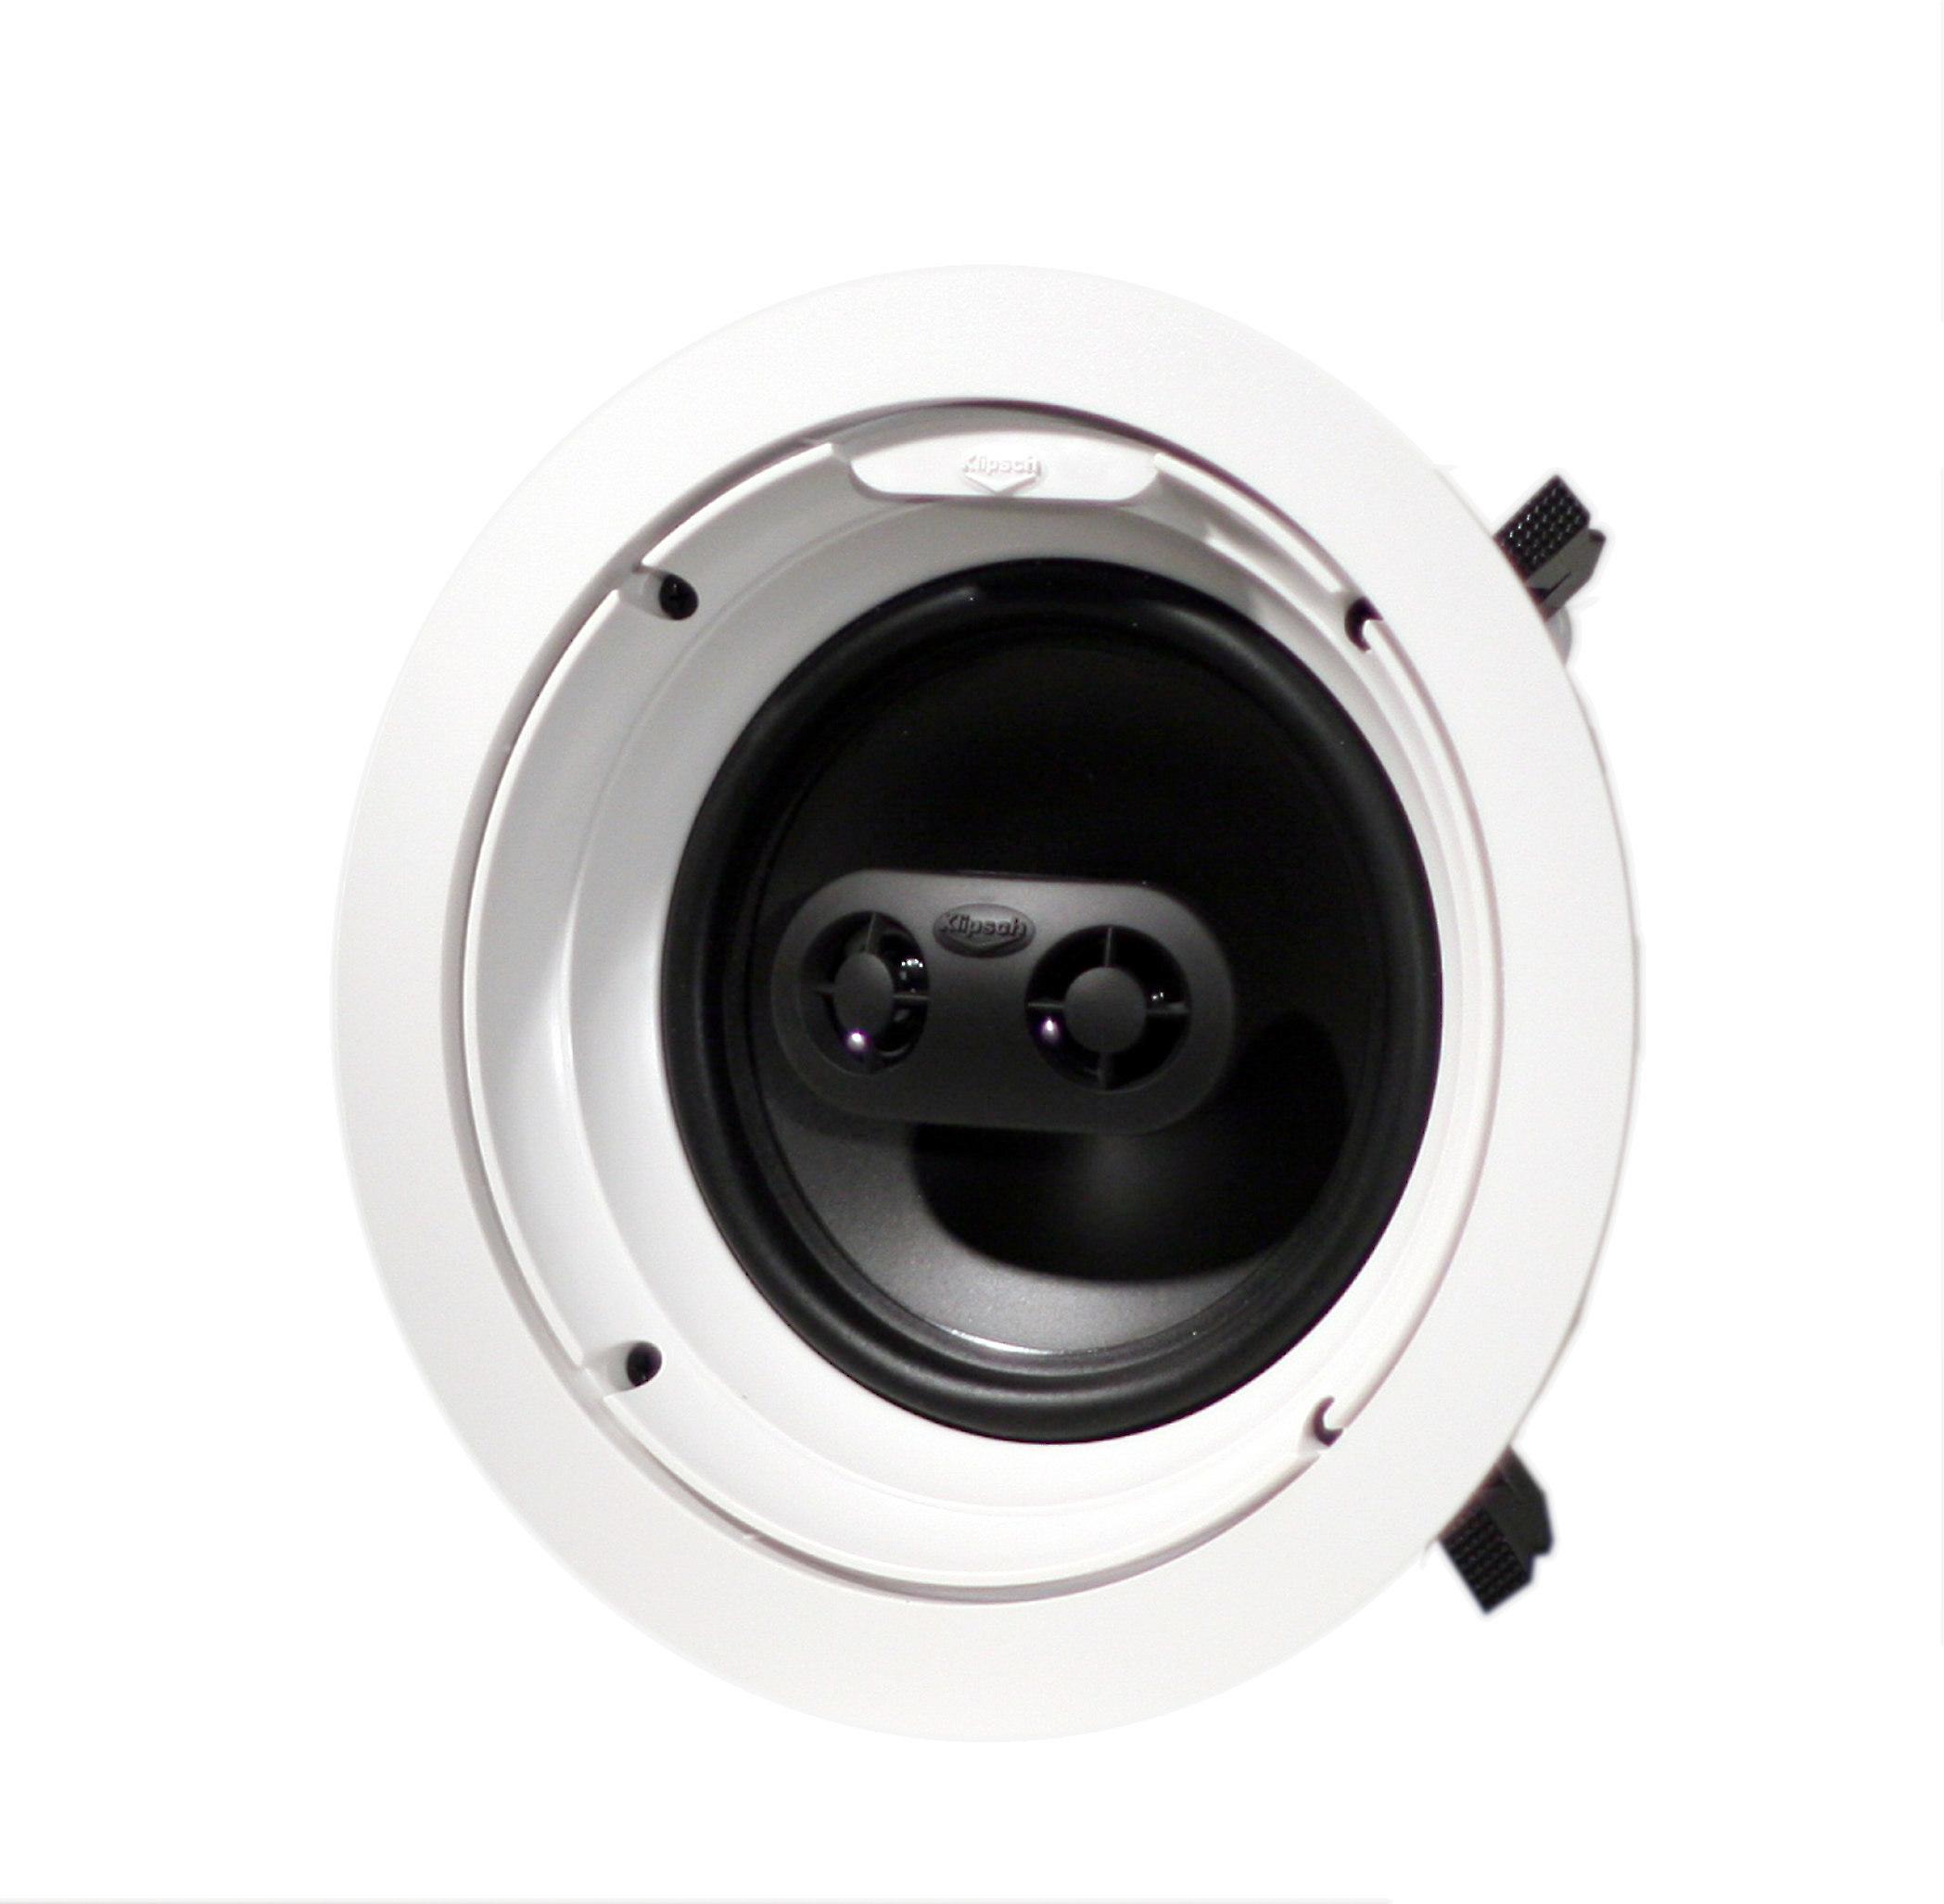 Klipsch R-1650-CSM In-ceiling stereo input speaker at Crutchfield